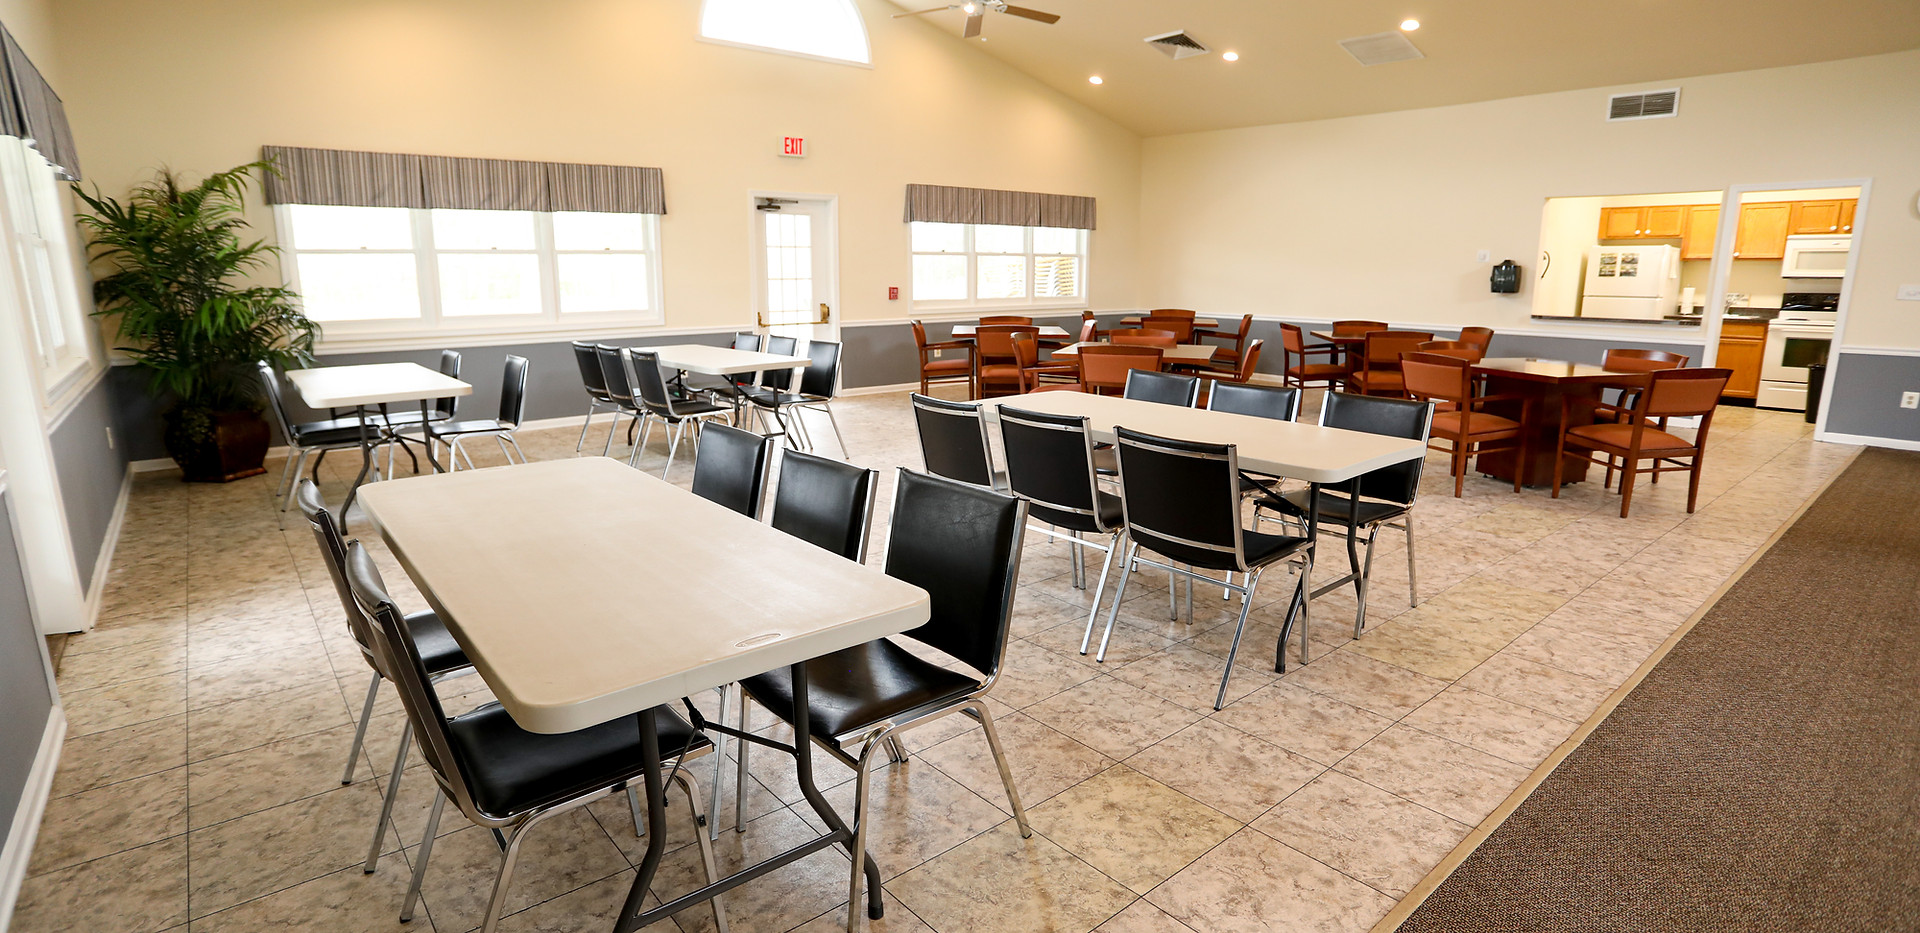 TM_Dining Hall-1.jpg